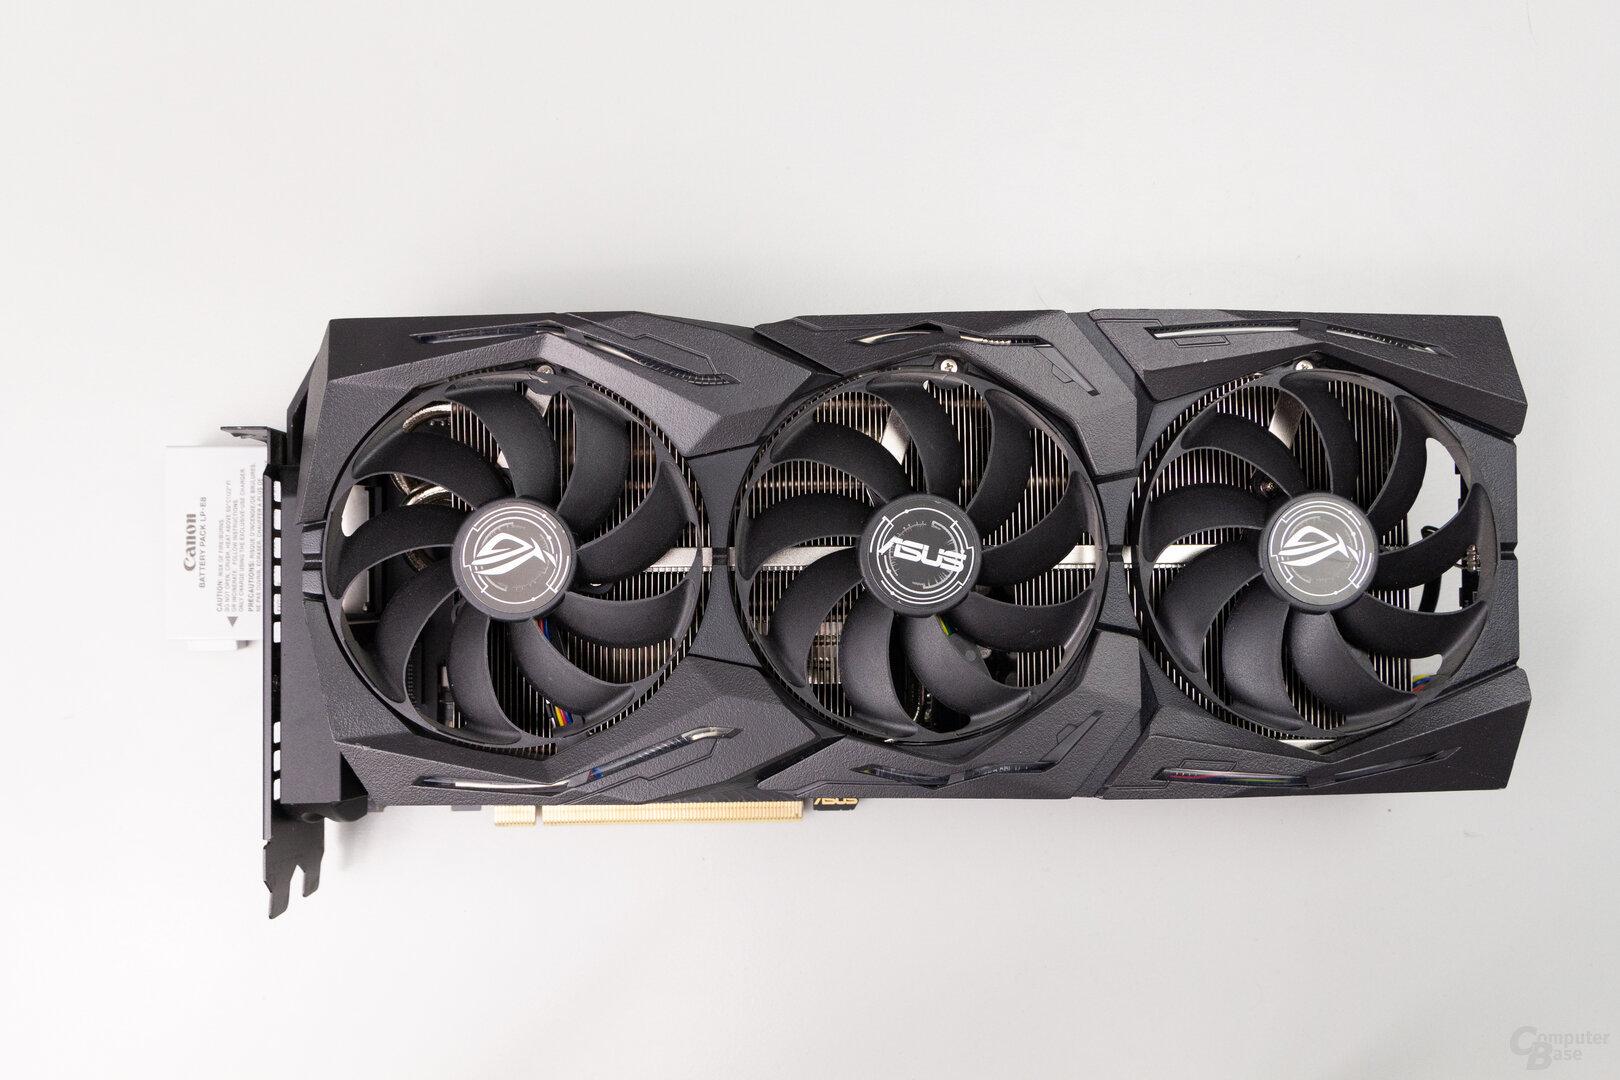 Asus GeForce RTX 2080 Ti Strix: 30,0 cm